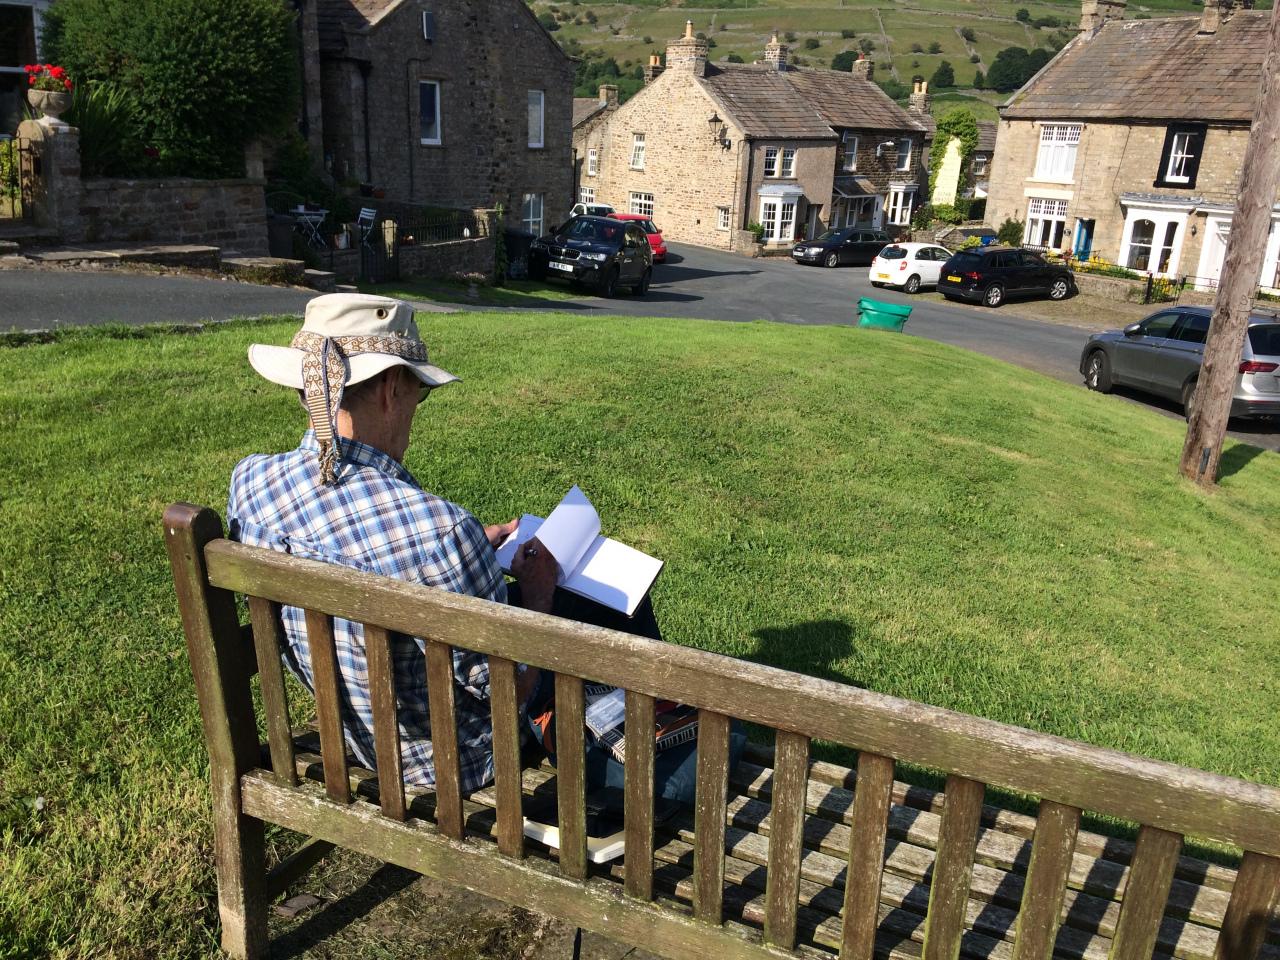 Yorkshire-sketch-photo-chuck